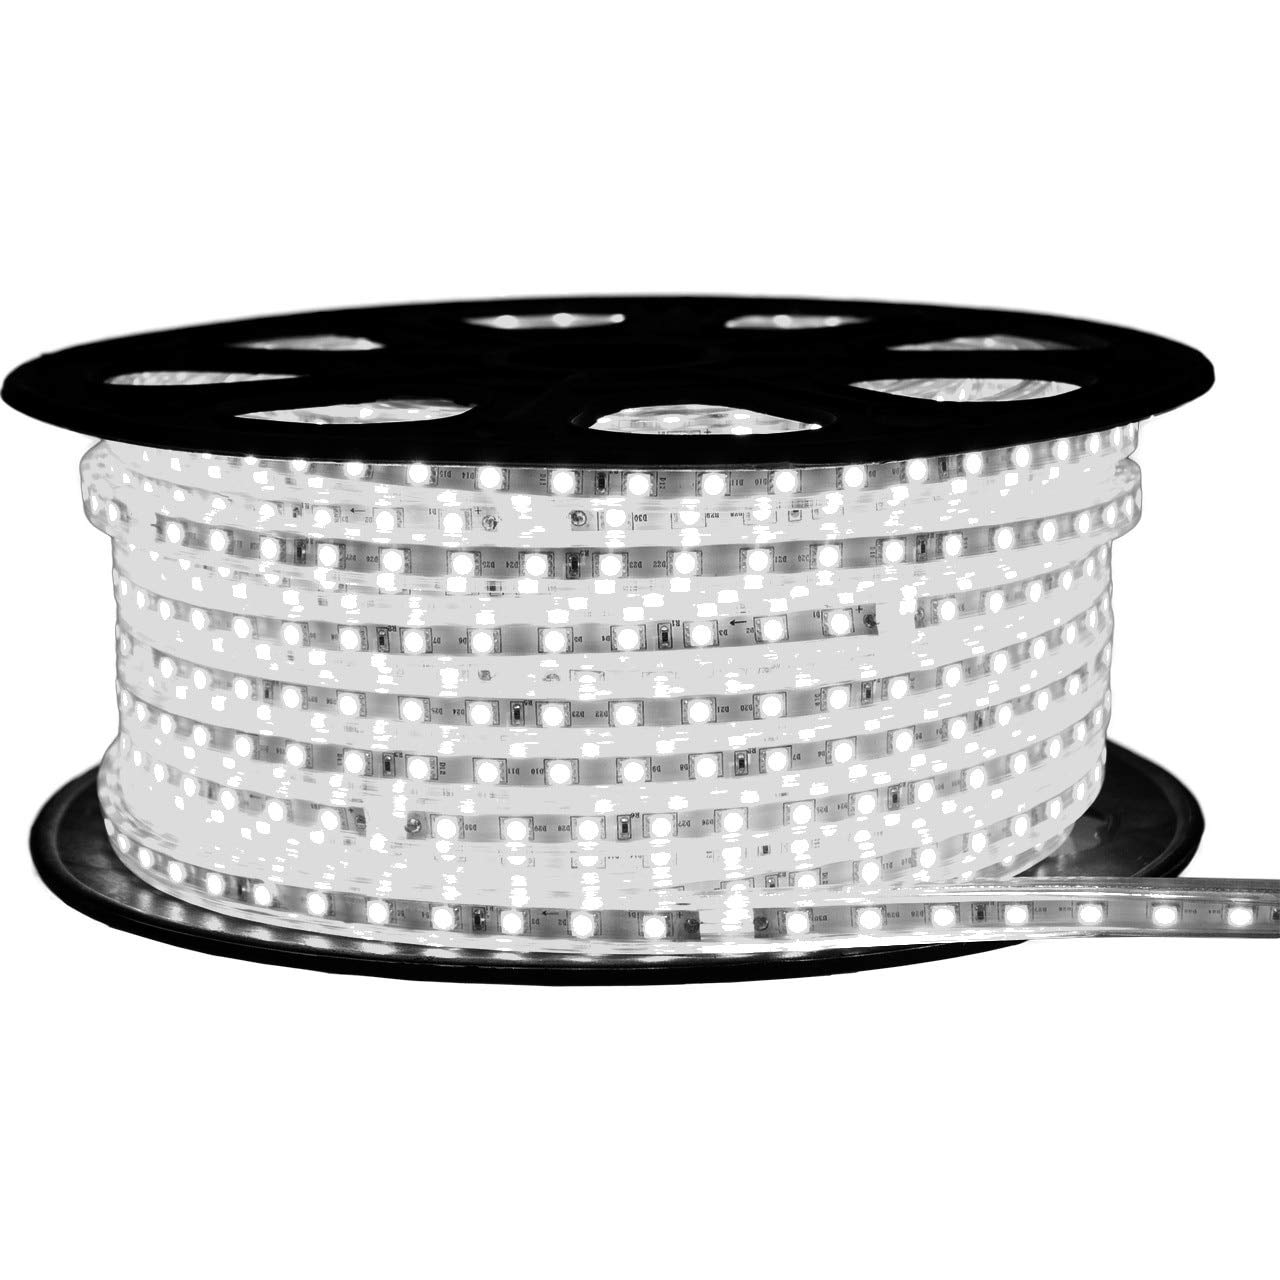 Cool White LED Strip Light - 120 Volt - Standard Output (SMD 3528) - 148 Feet